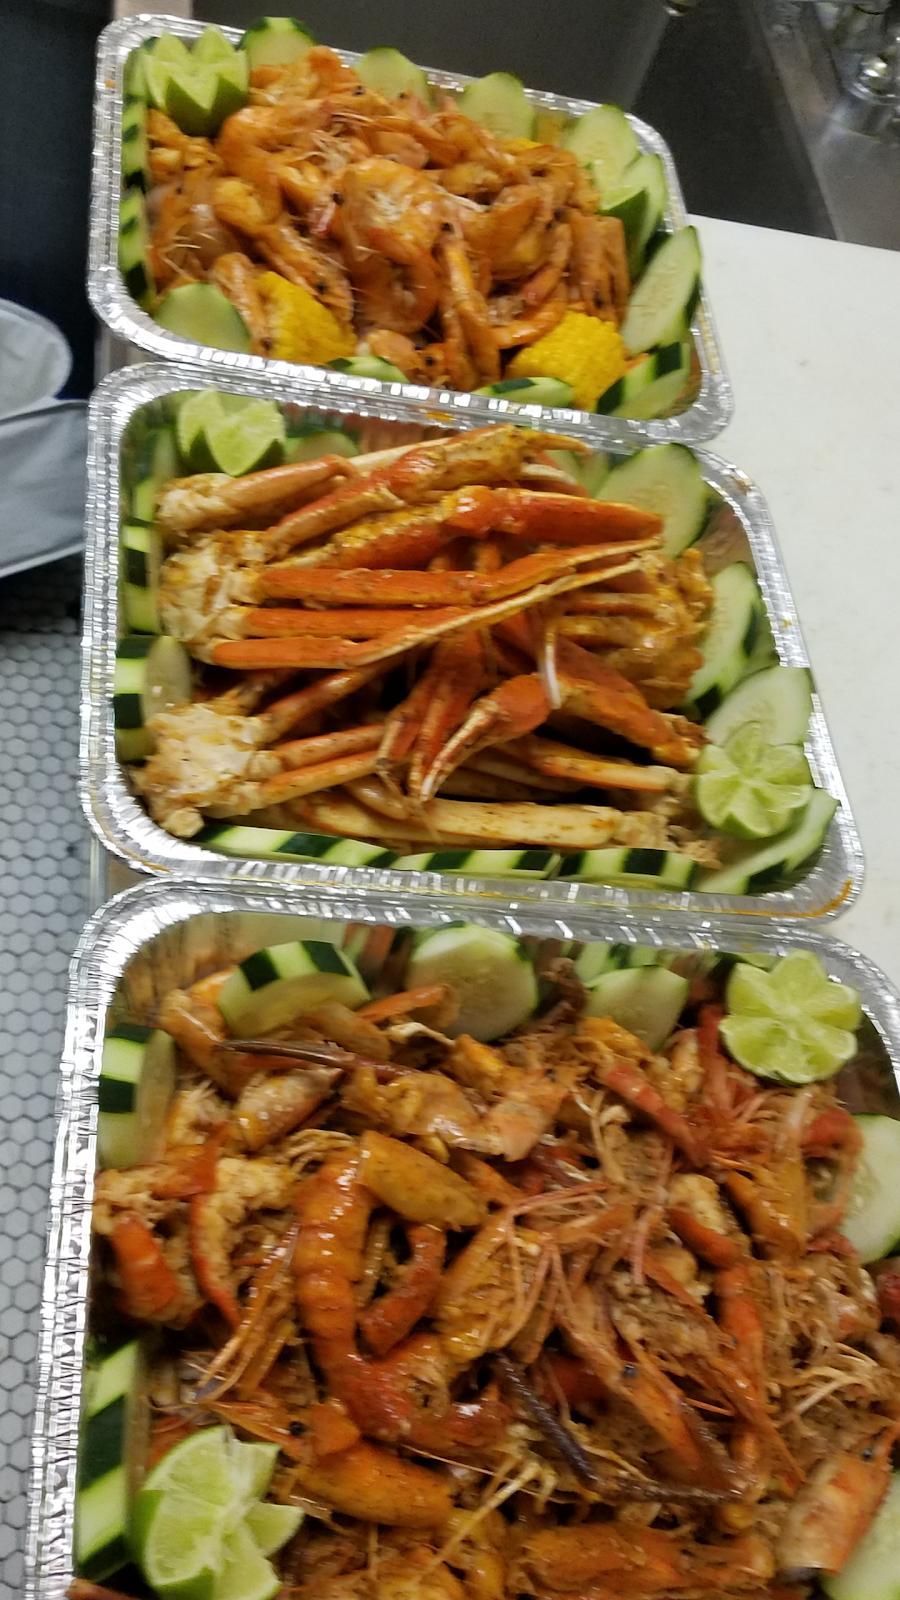 El Marisquerito Seafood Catering   restaurant   2912 N Major Ave, Chicago, IL 60634, USA